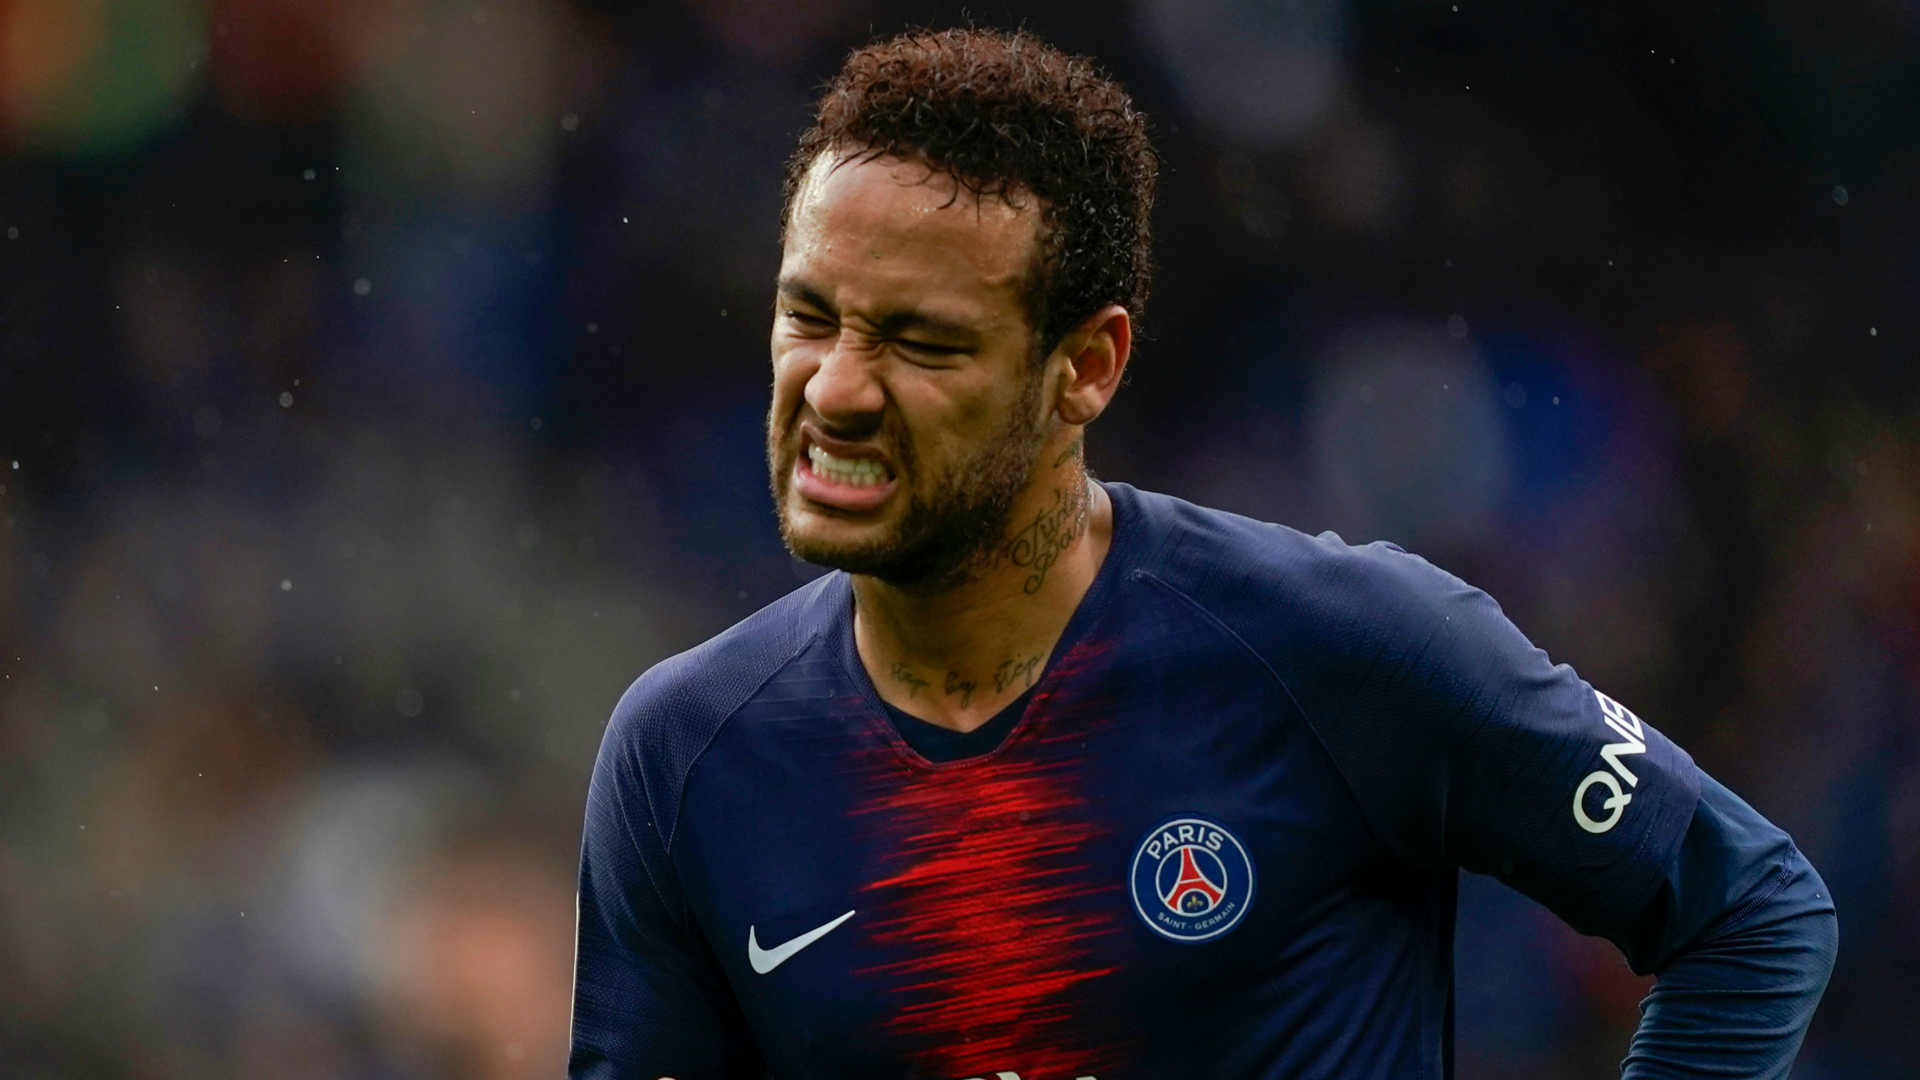 PSG president Al-Khelaifi hands control to Leonardo amid Neymar exit talk